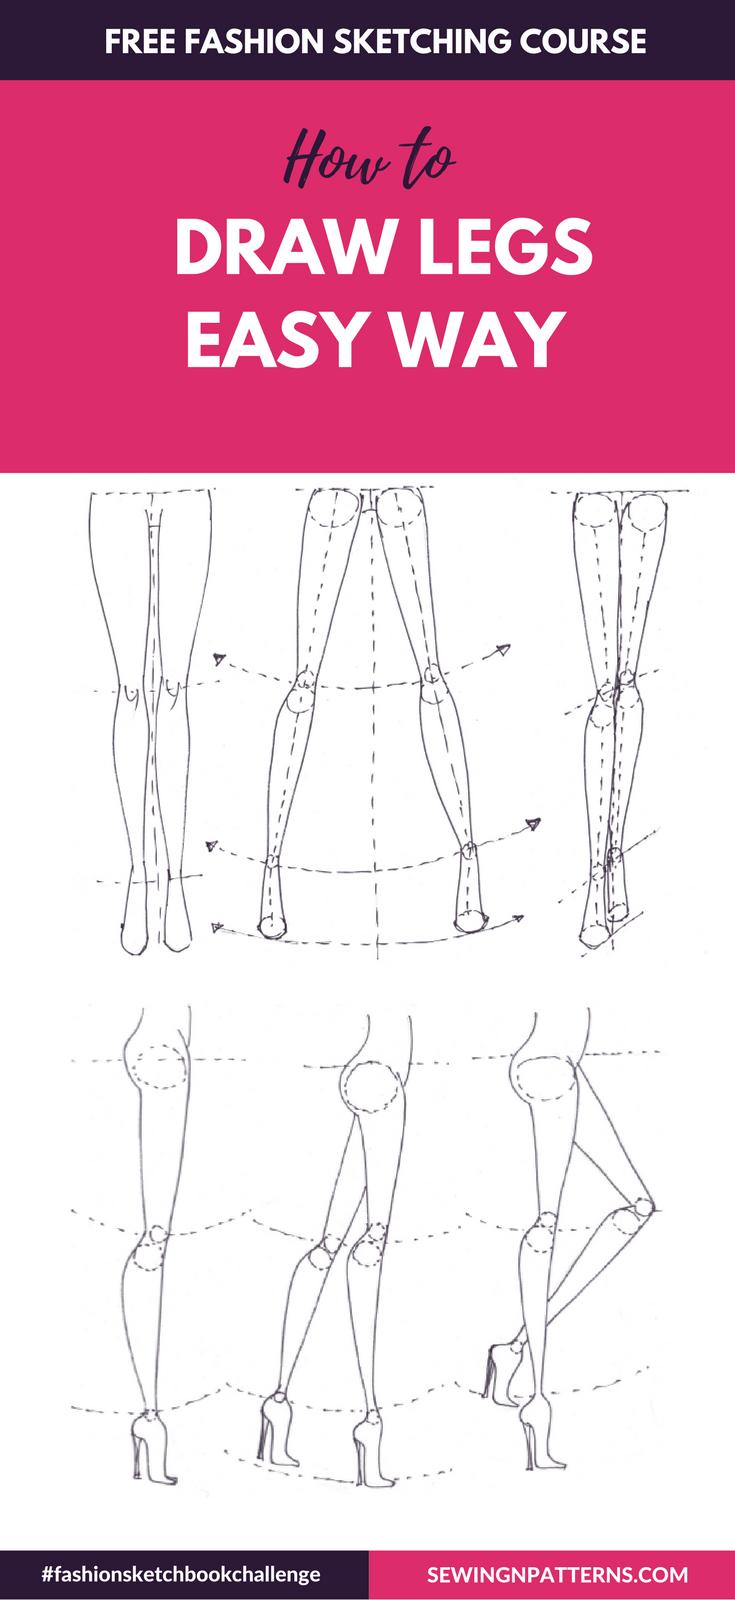 Fashion Sketchboook Challenge New – Sewing Patterns – Do you want fashion design sketches … – Fashion design sketches – Amanda Blog